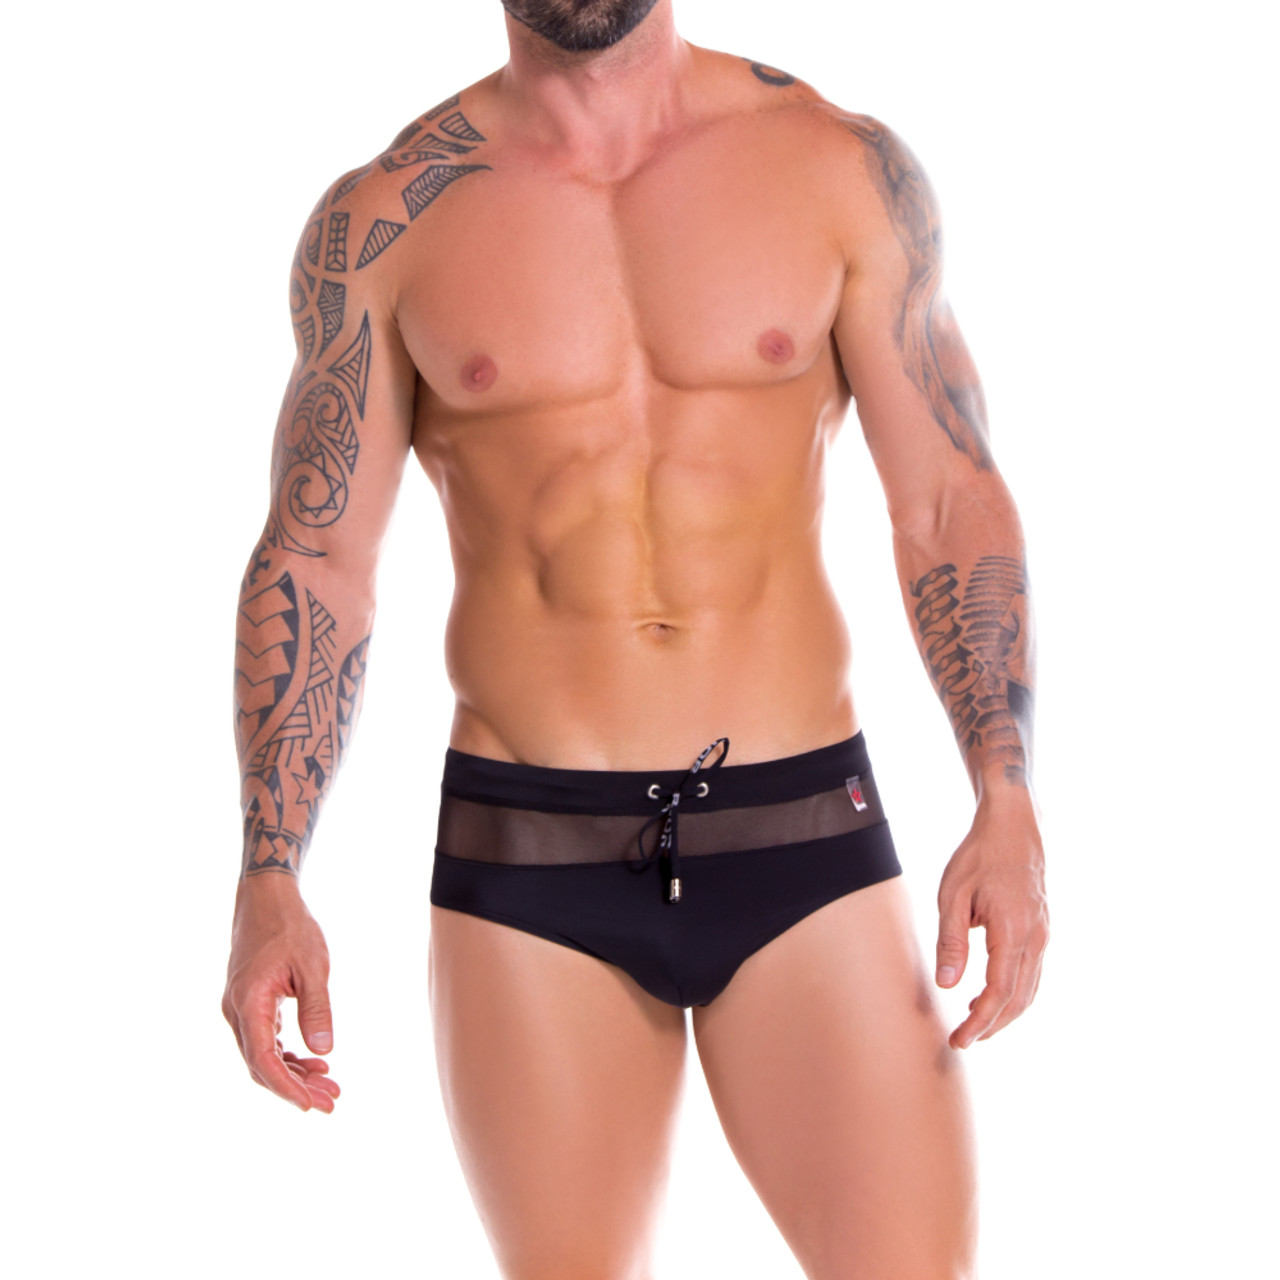 JOR Mesh Swim Trunks - Mens Swimwear with See-Through Mesh Strip